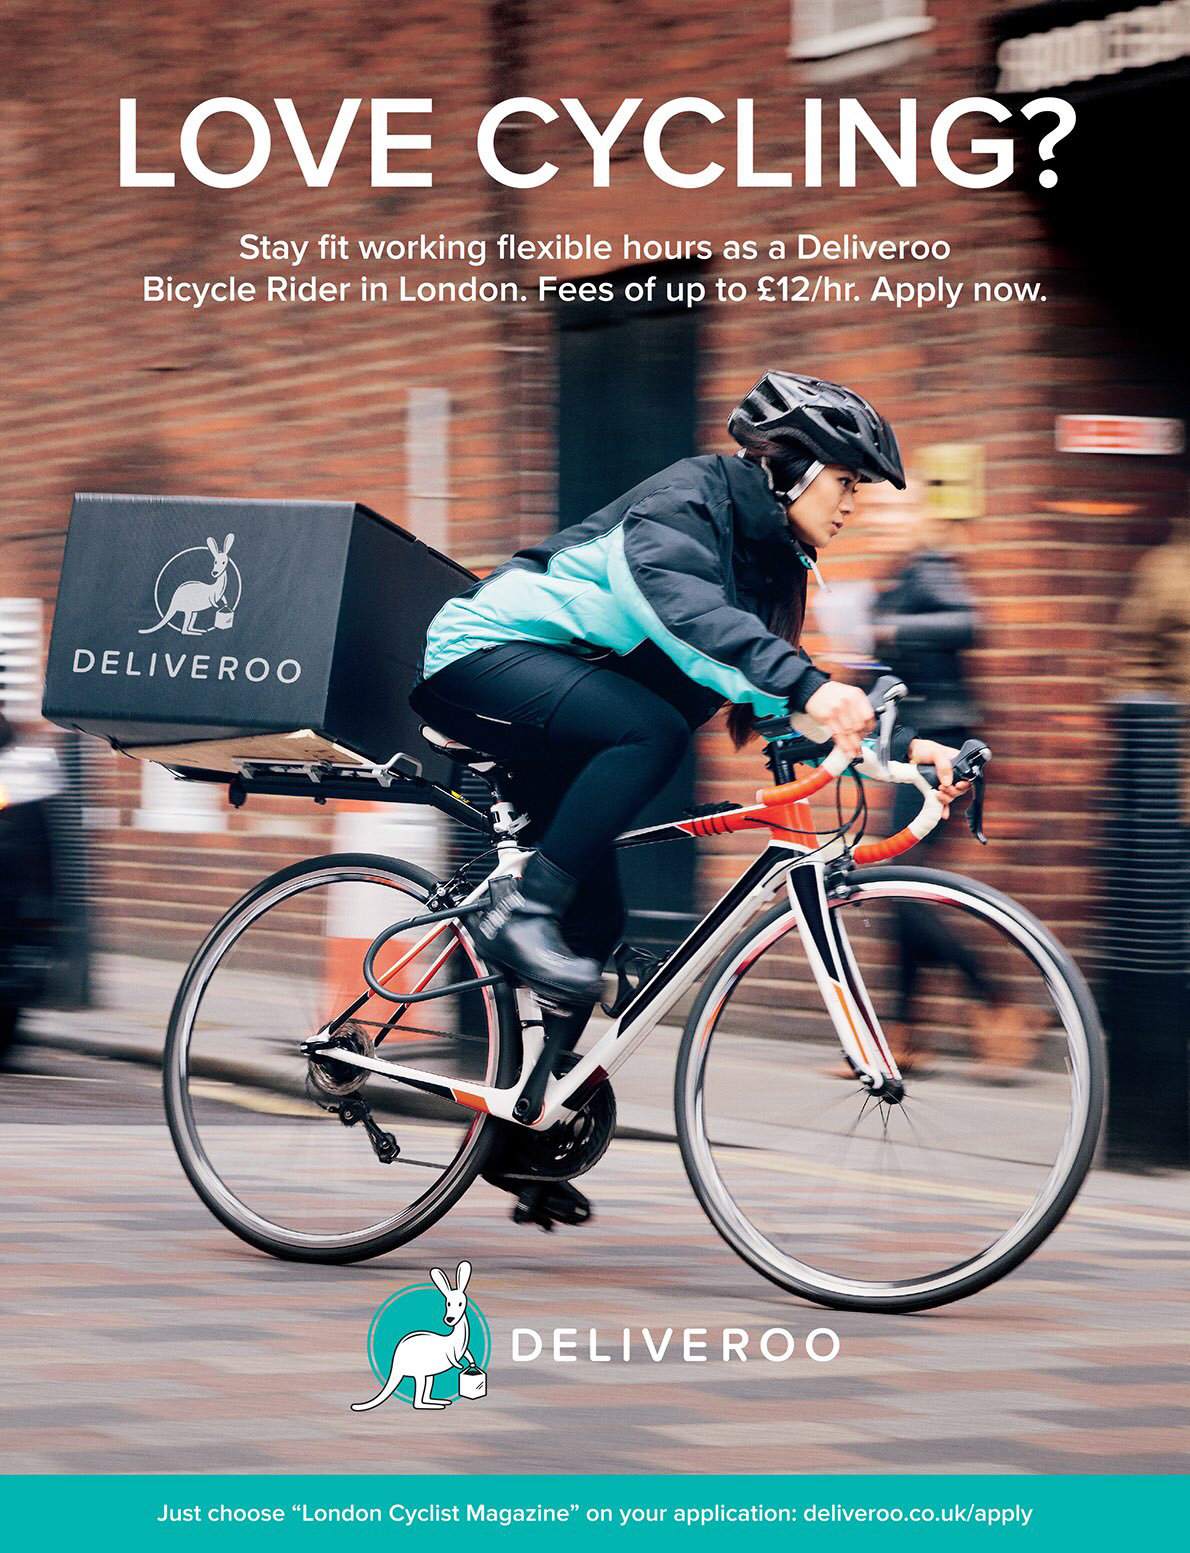 Deliveroo Food Delivery Bike Stay Fit Tshirt Design Inspiration